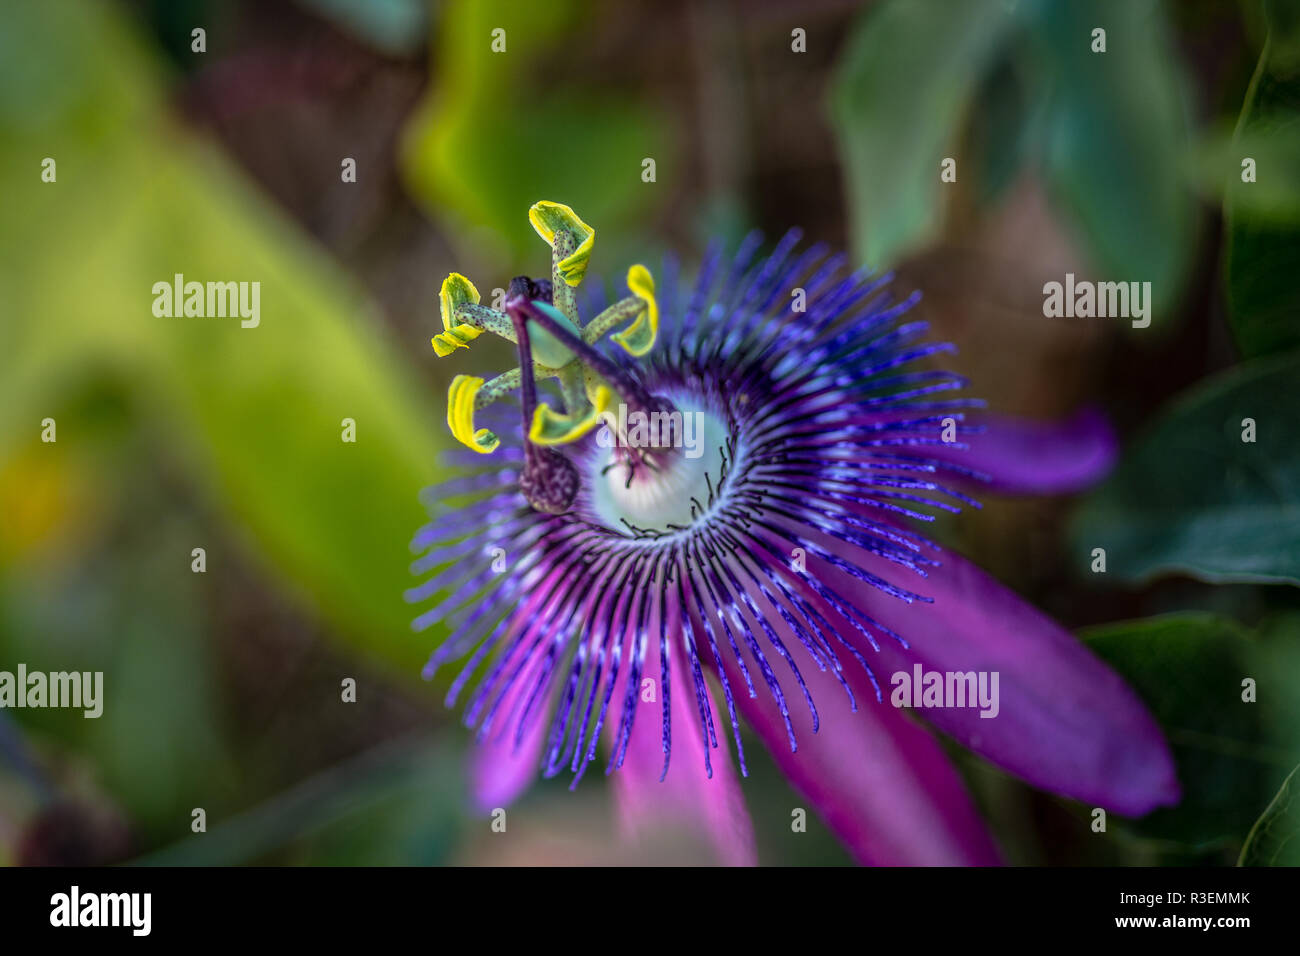 Blüte einer Passionsblume - Stock Image